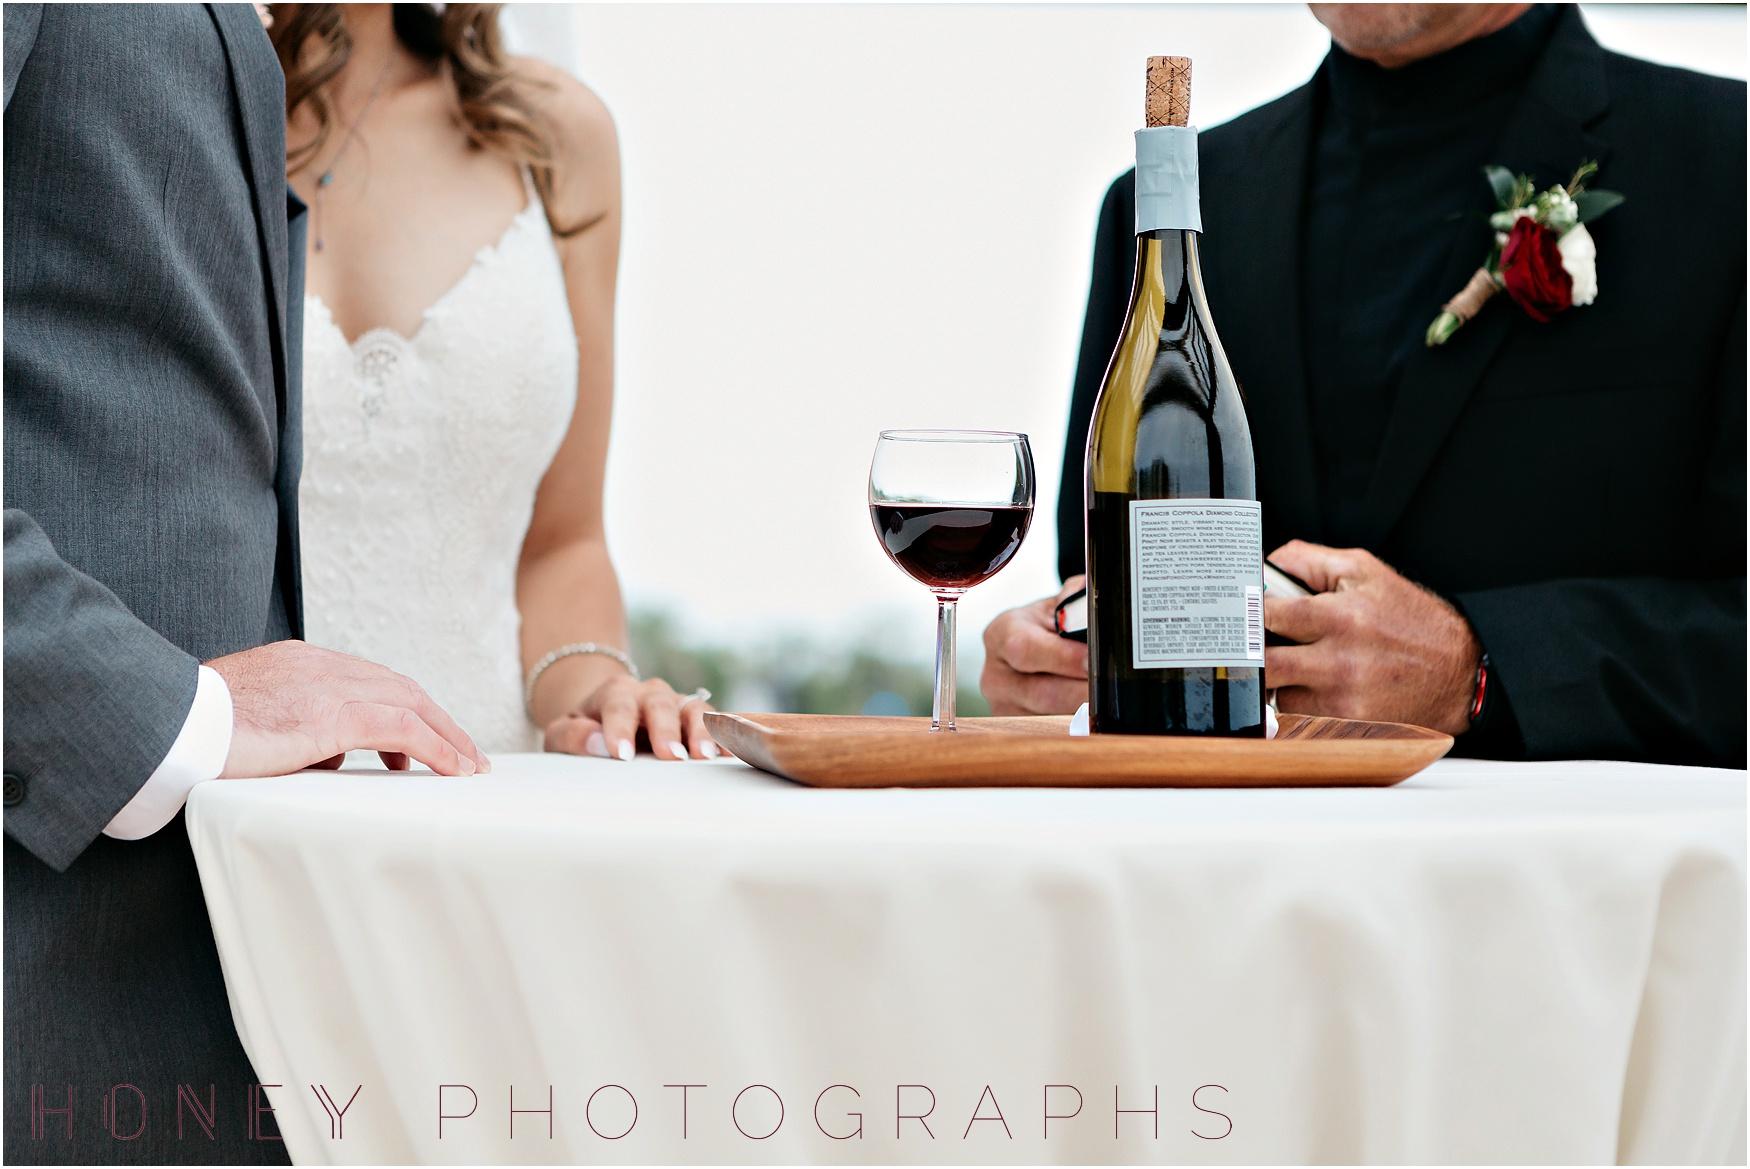 garden-classic-burgundy-jewel-tone-luxury-pacific-event-oceanside-wedding32.jpg